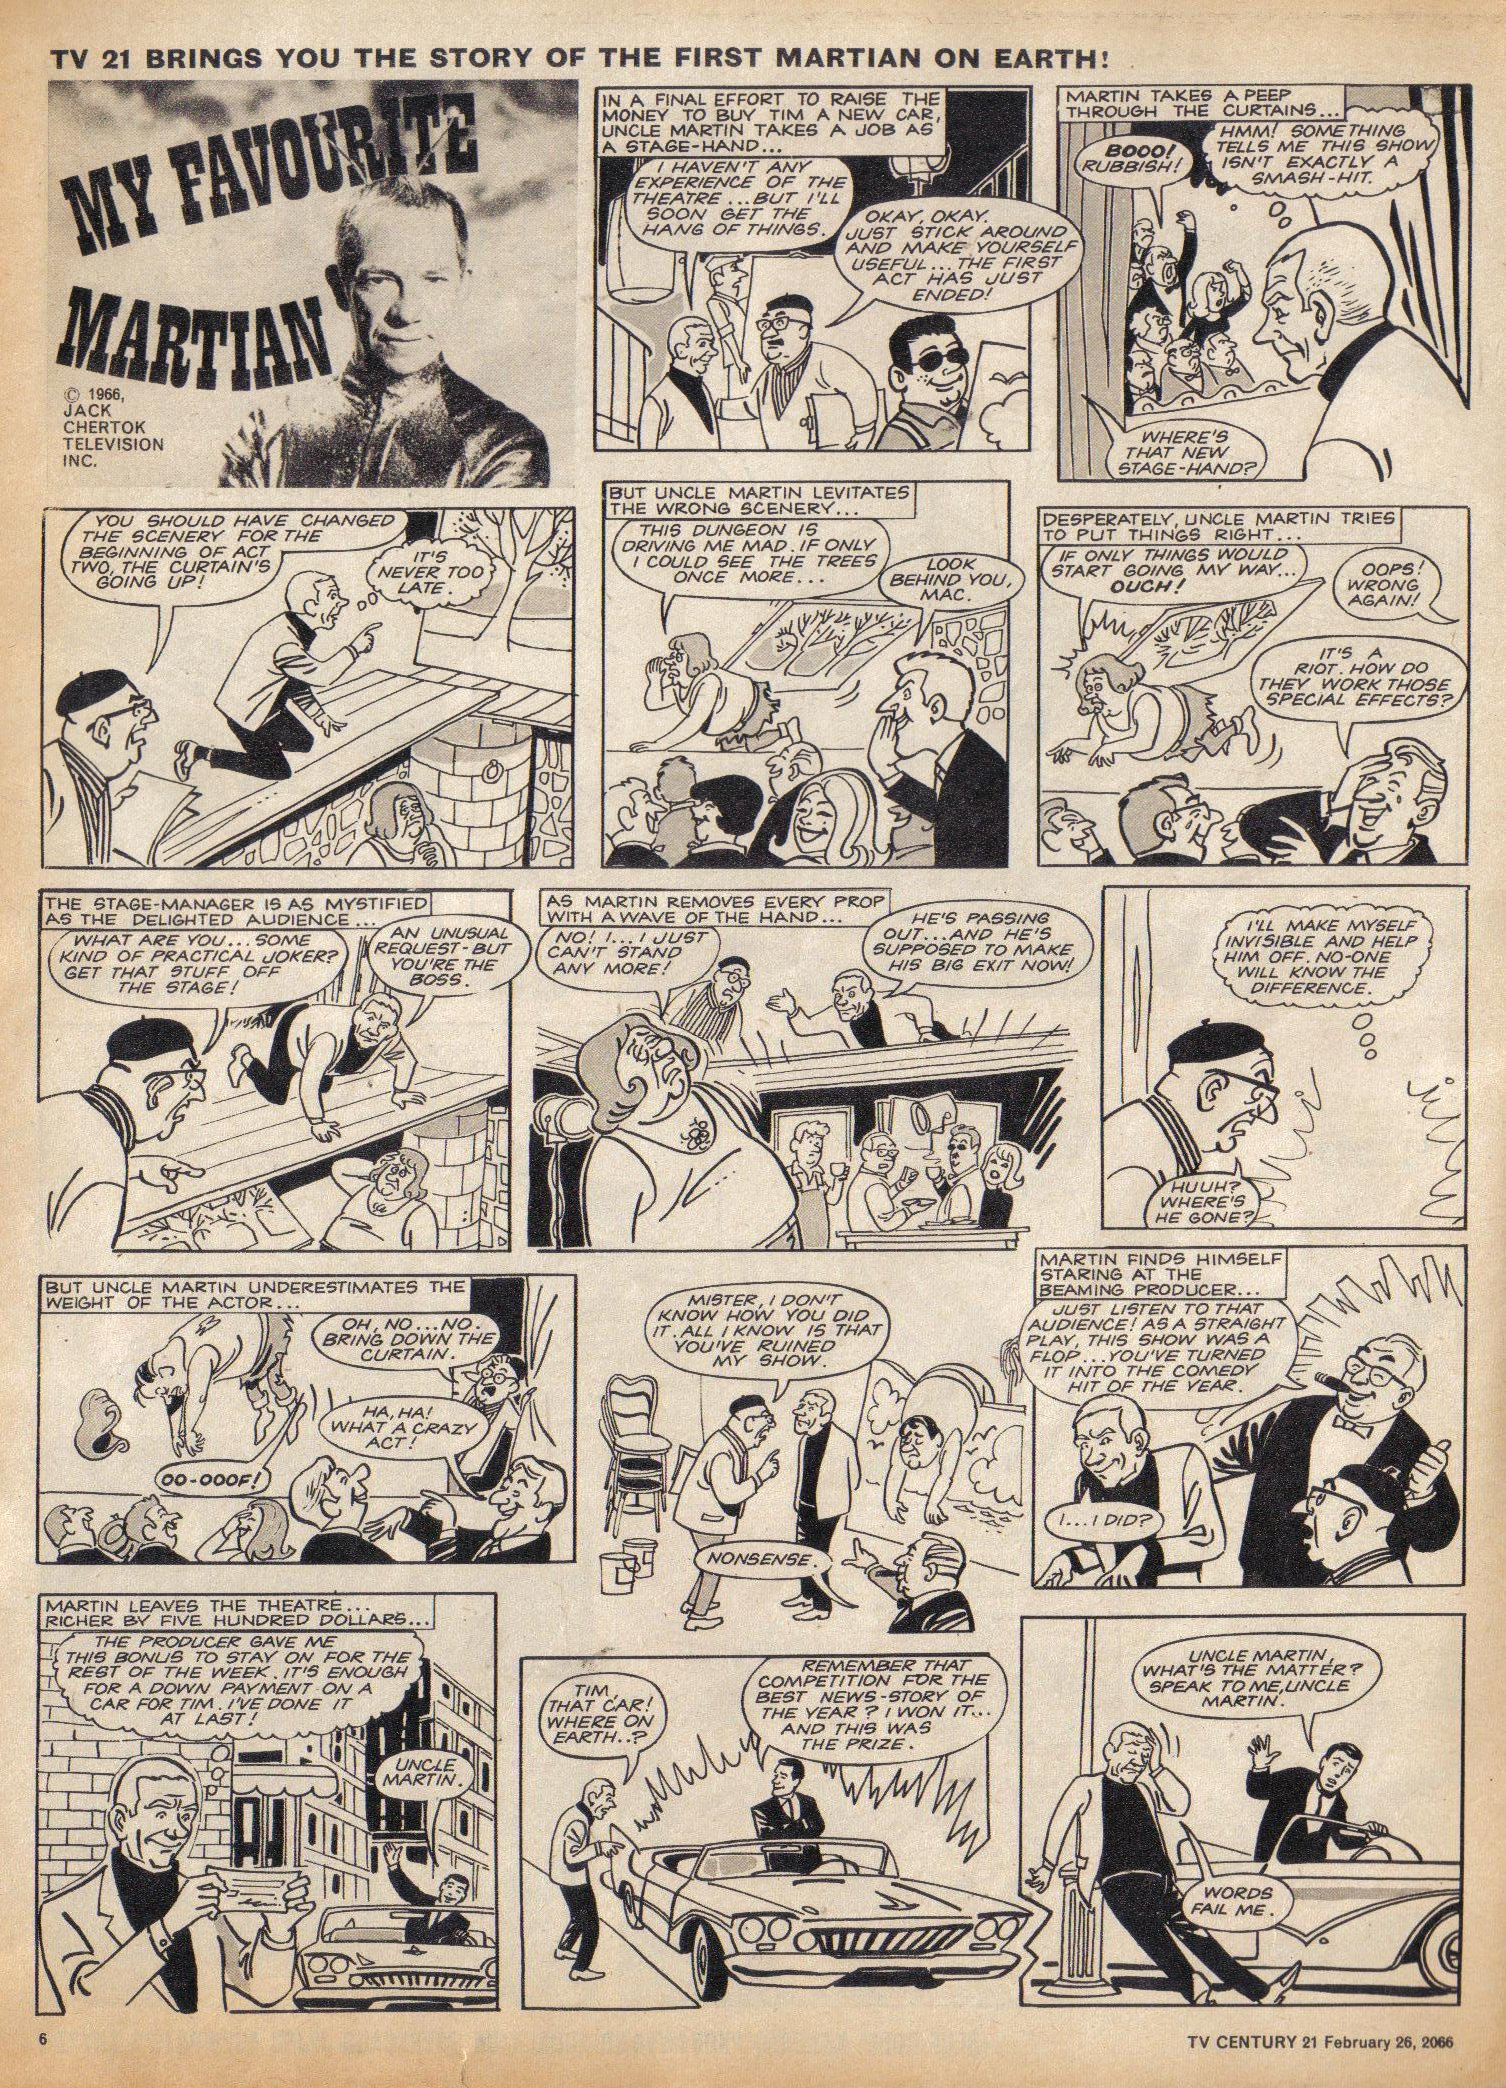 Read online TV Century 21 (TV 21) comic -  Issue #58 - 6